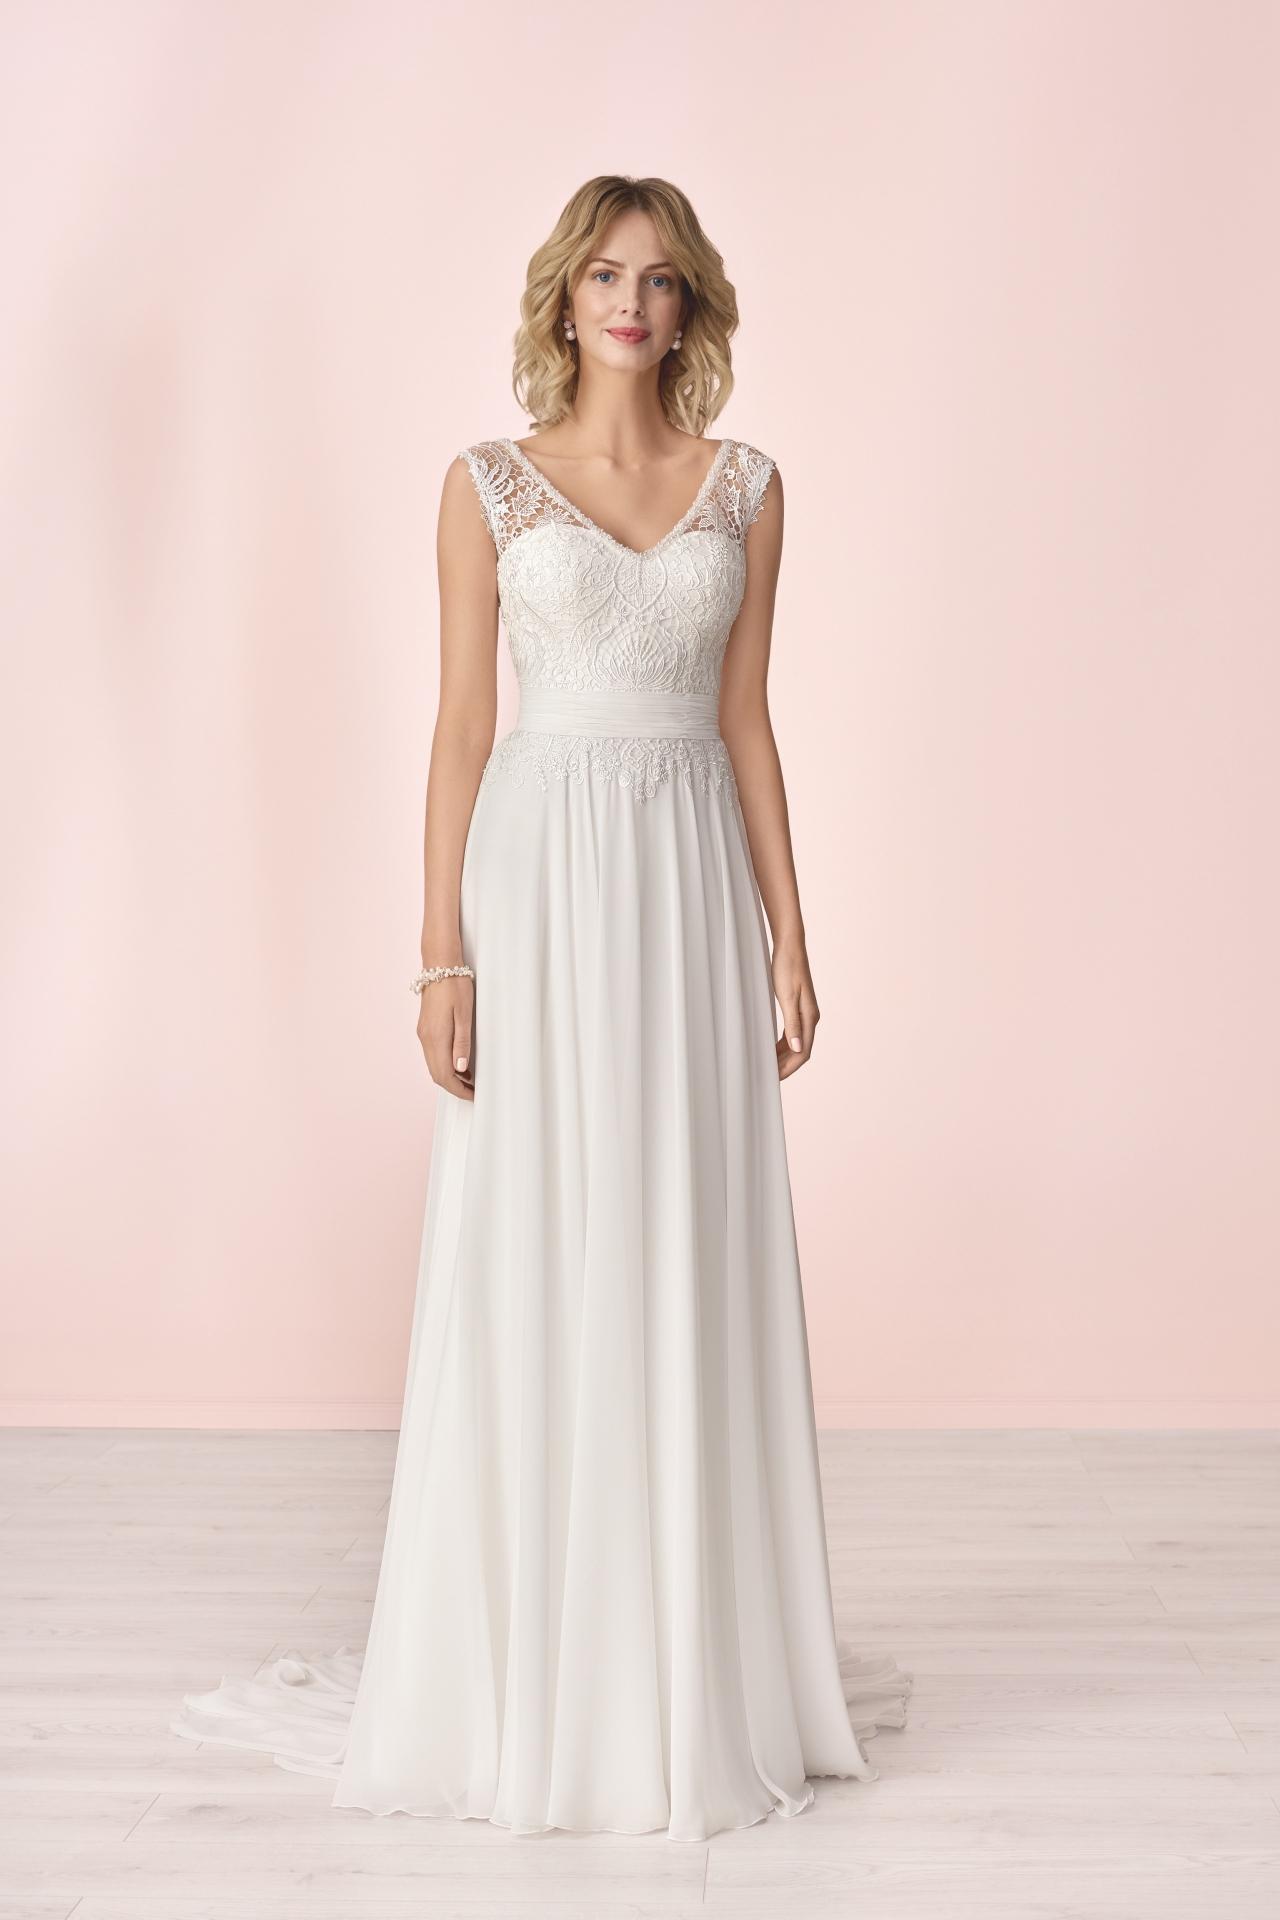 Brautkleid Elizabeth Konin 2019 - 4159T-1